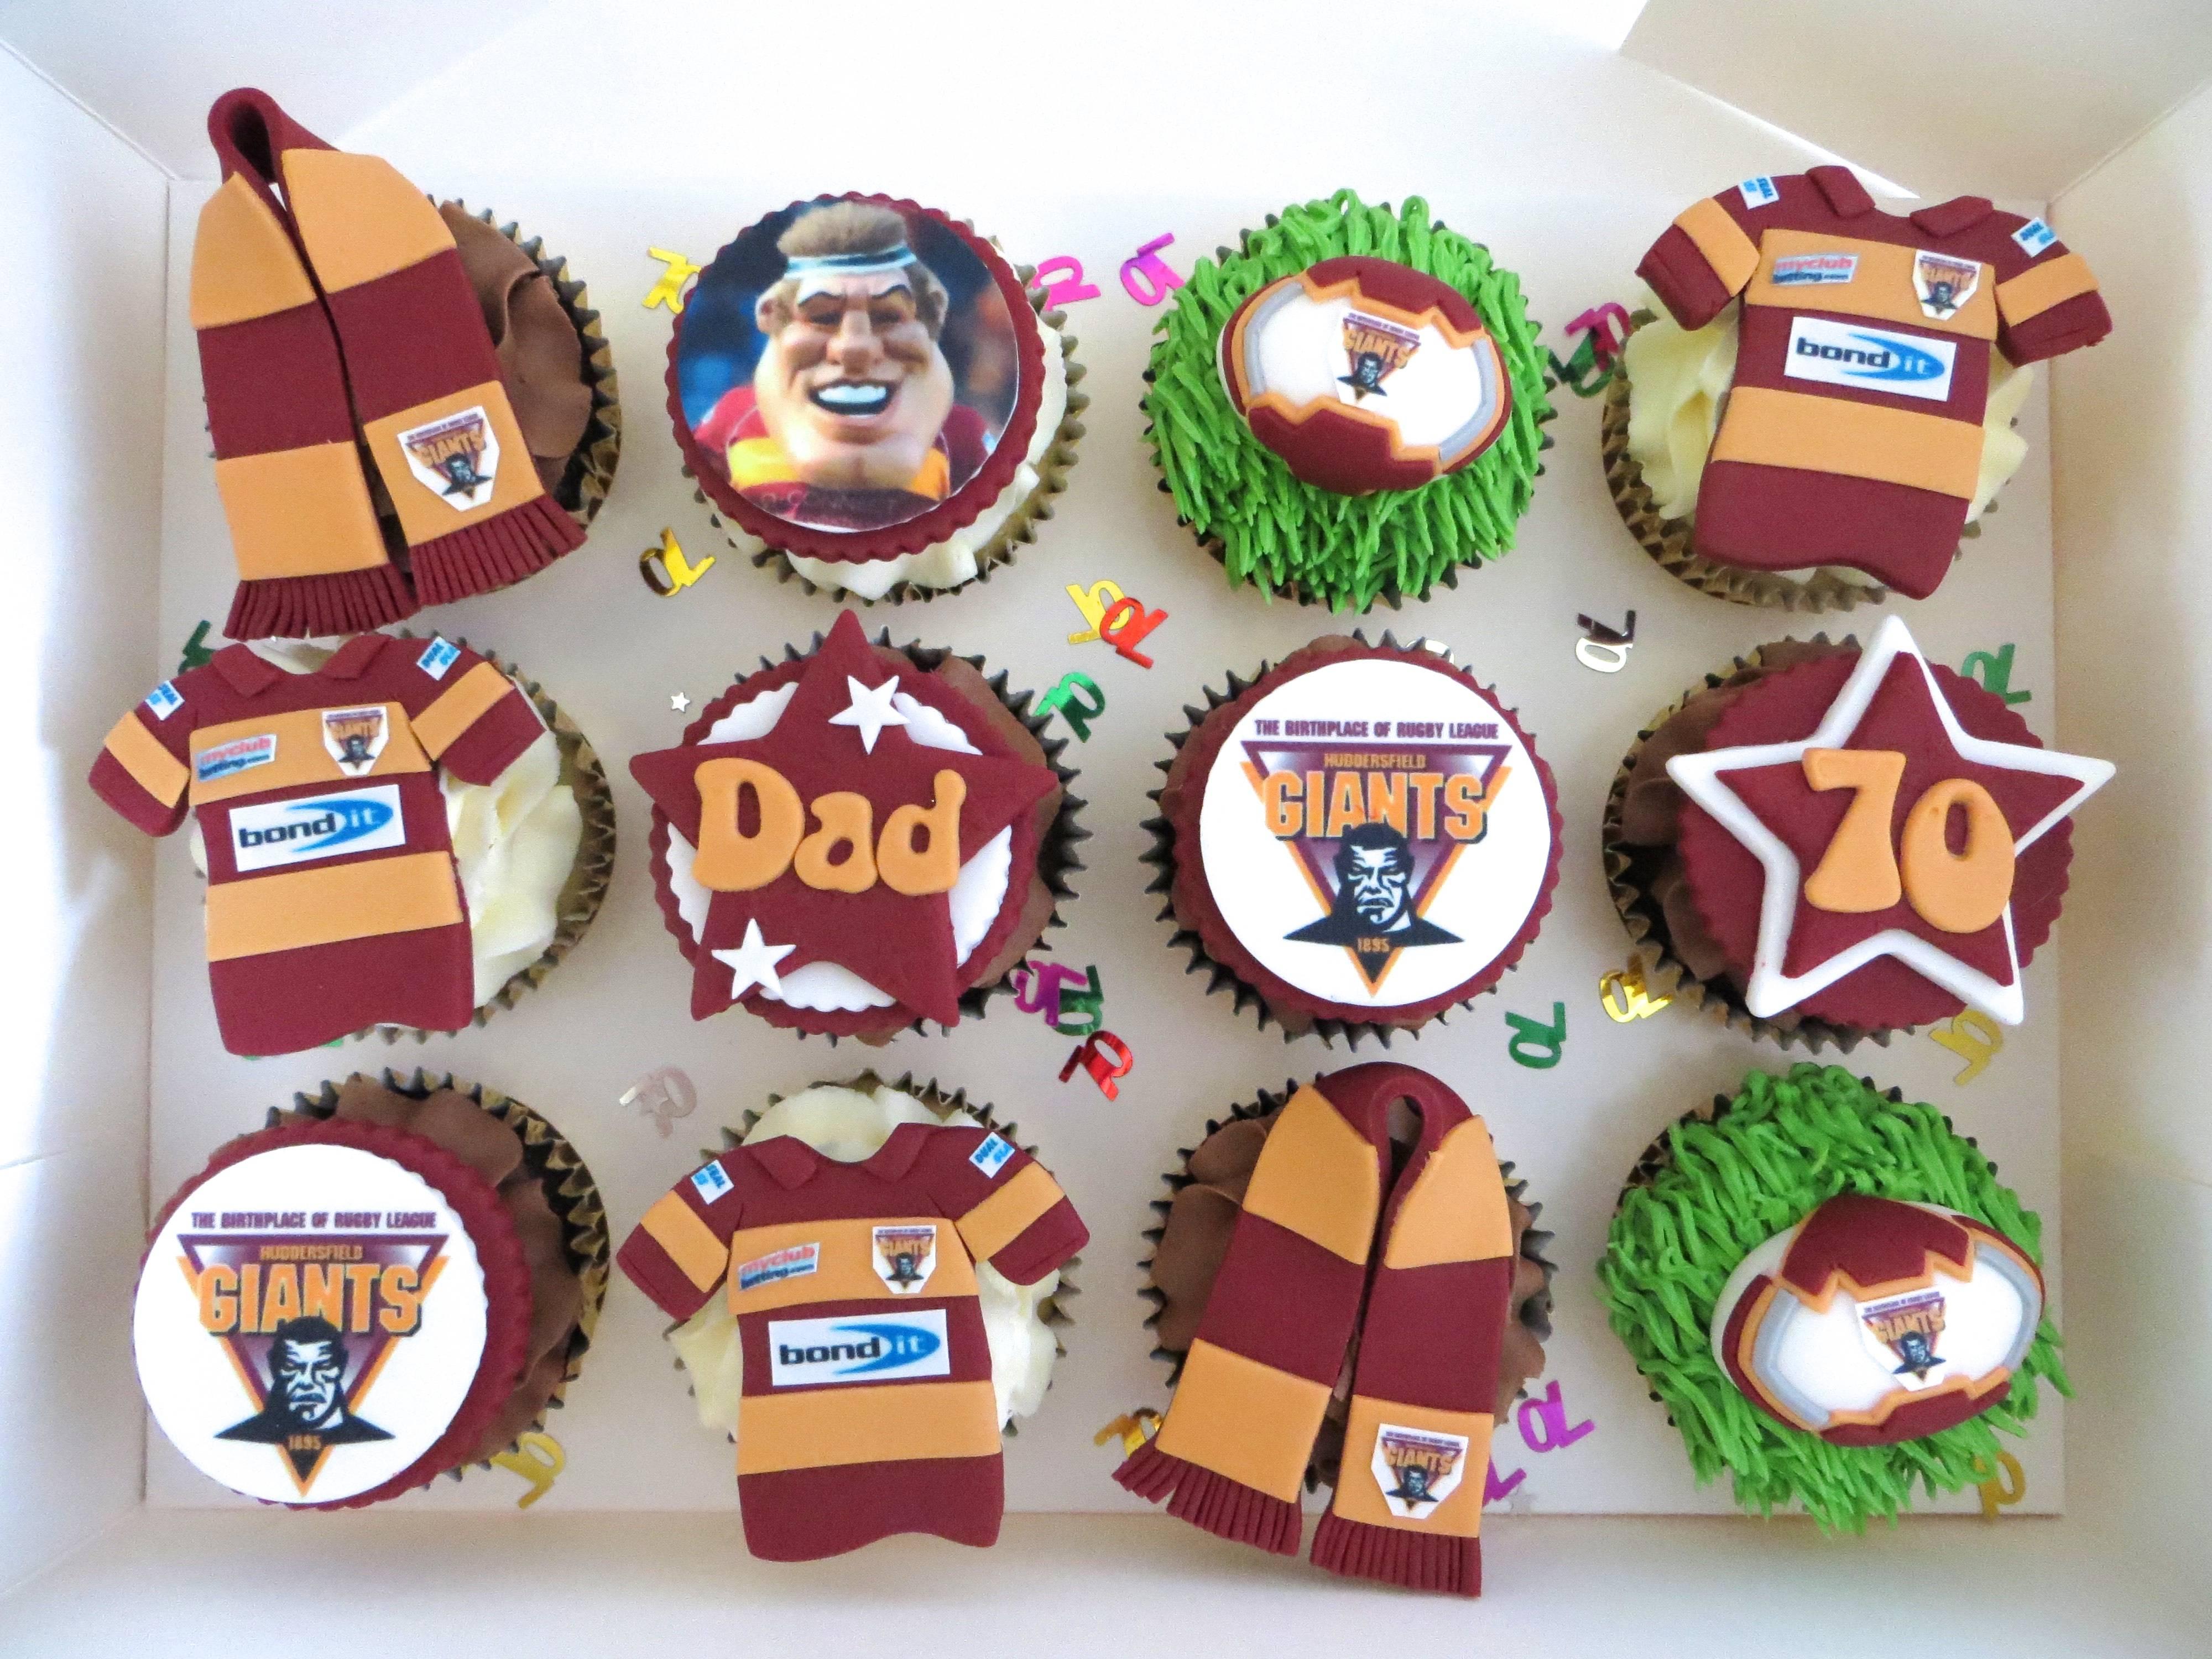 Huddersfield Giants cupcakes